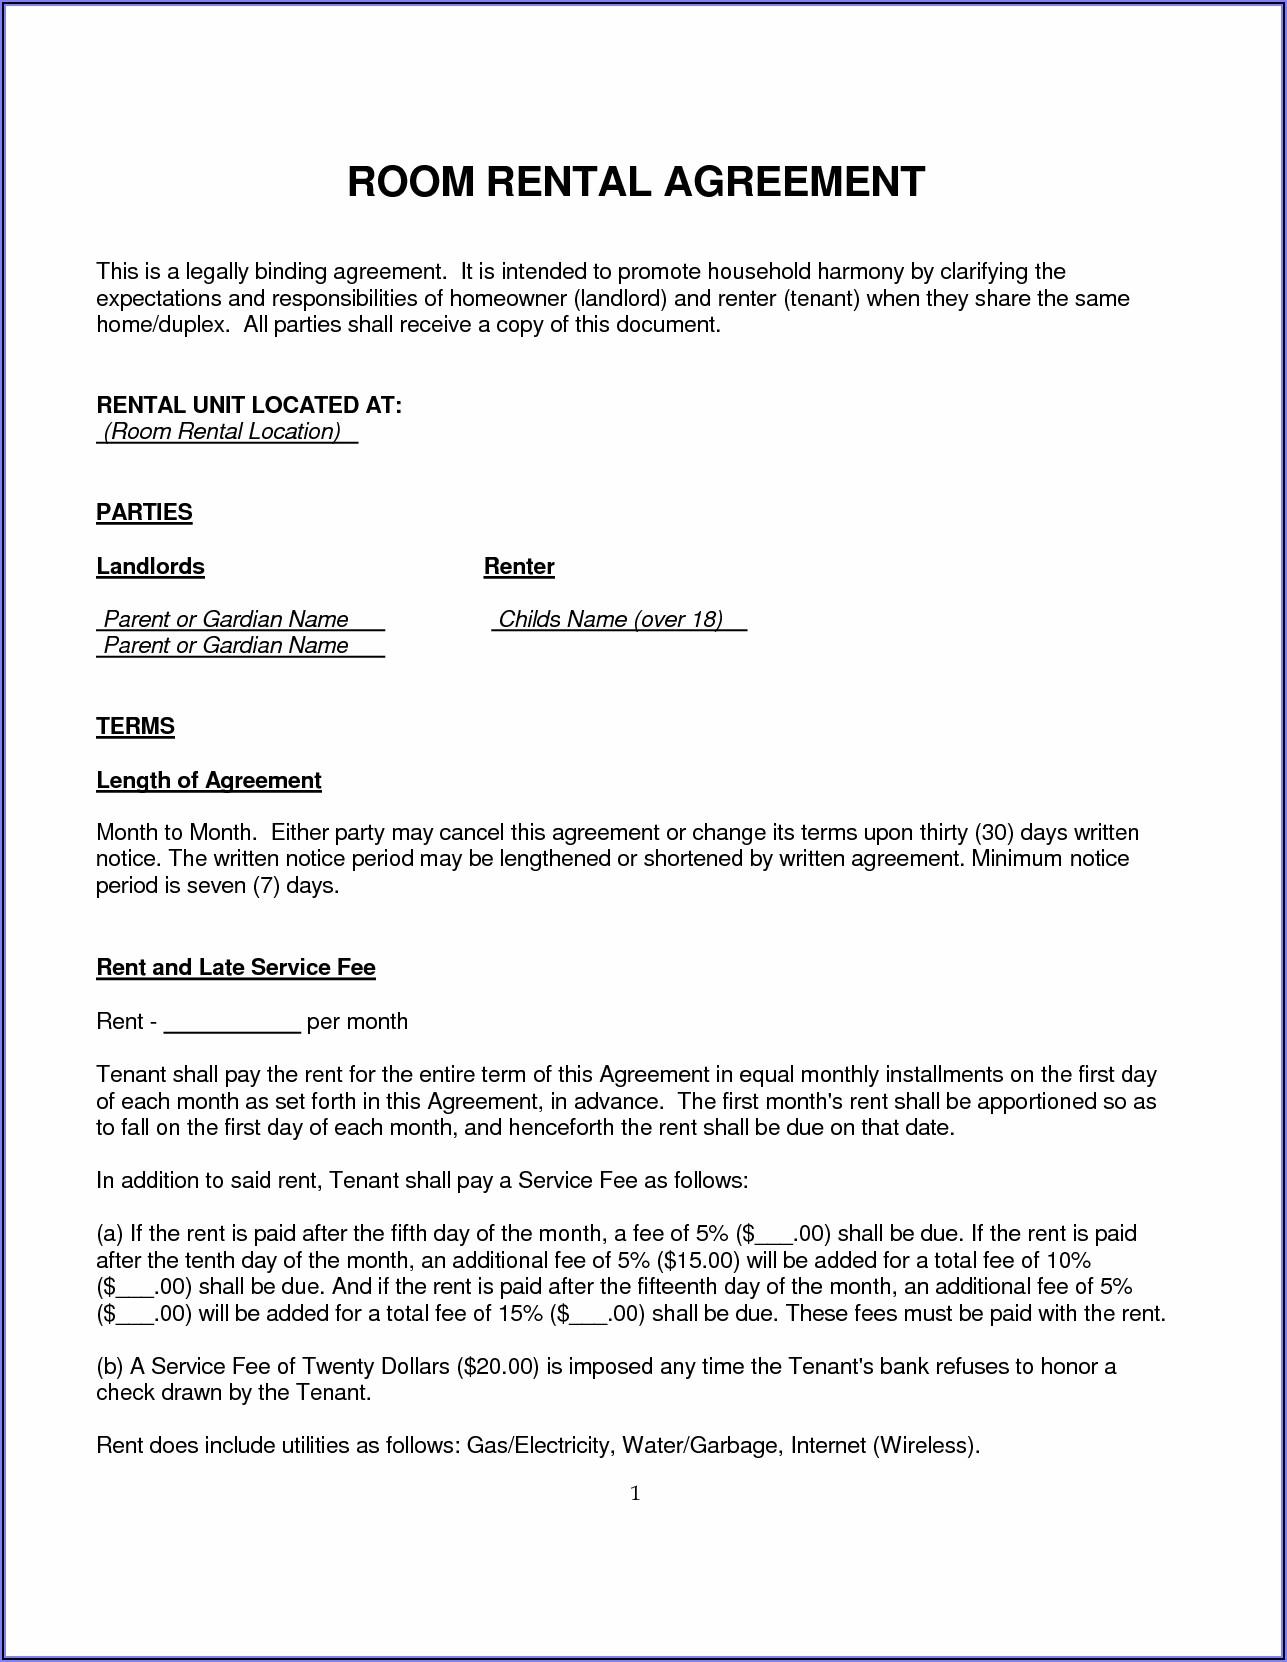 Room Rental Agreement Template Word Doc Uk